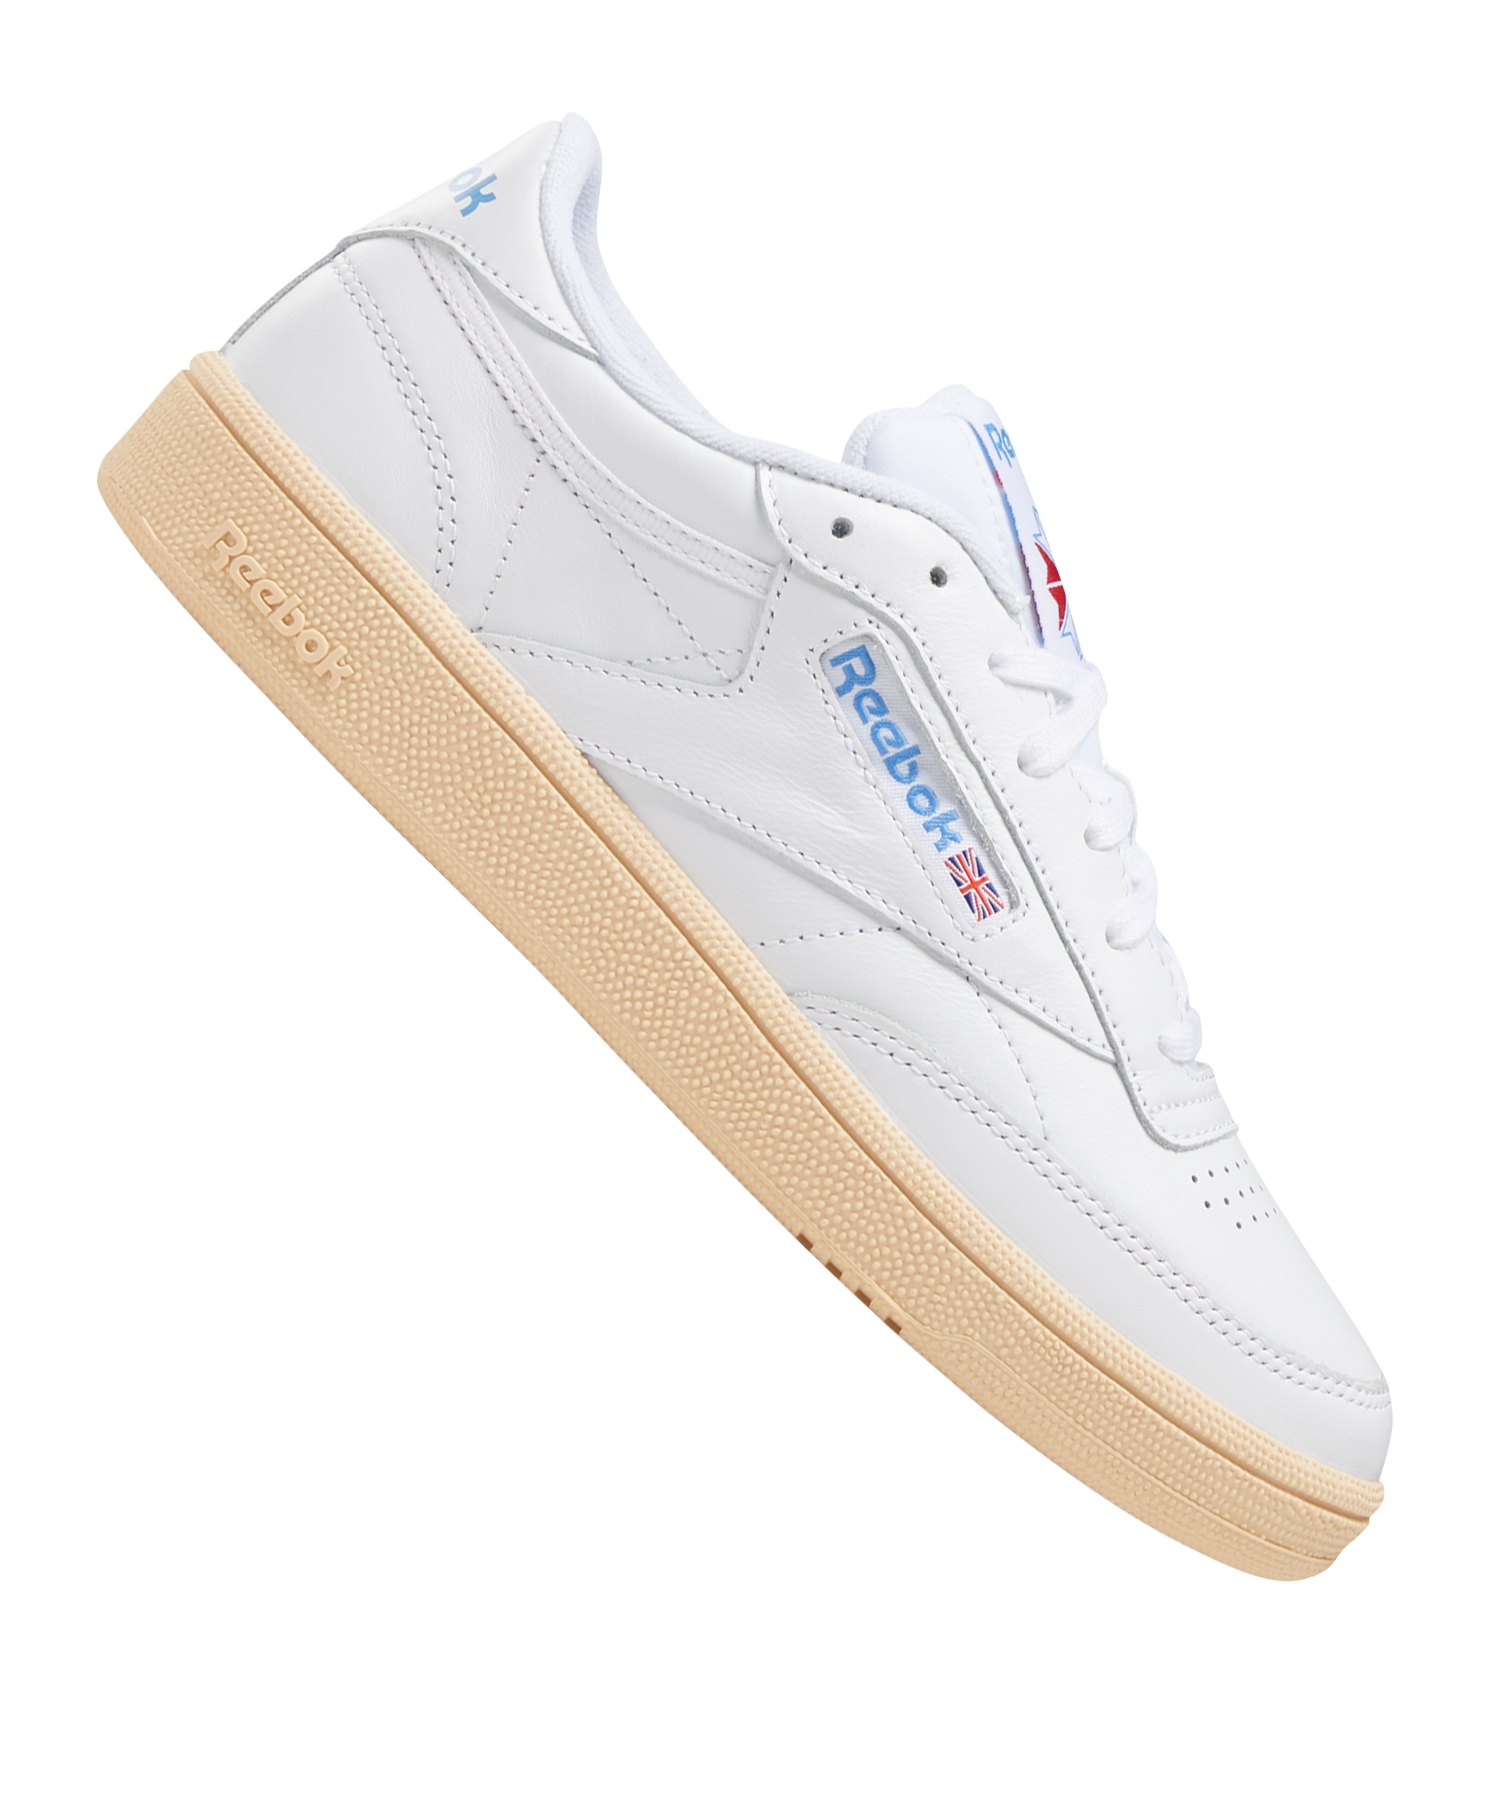 Reebok Herren Schuhe Sneaker Club C 85 EL: